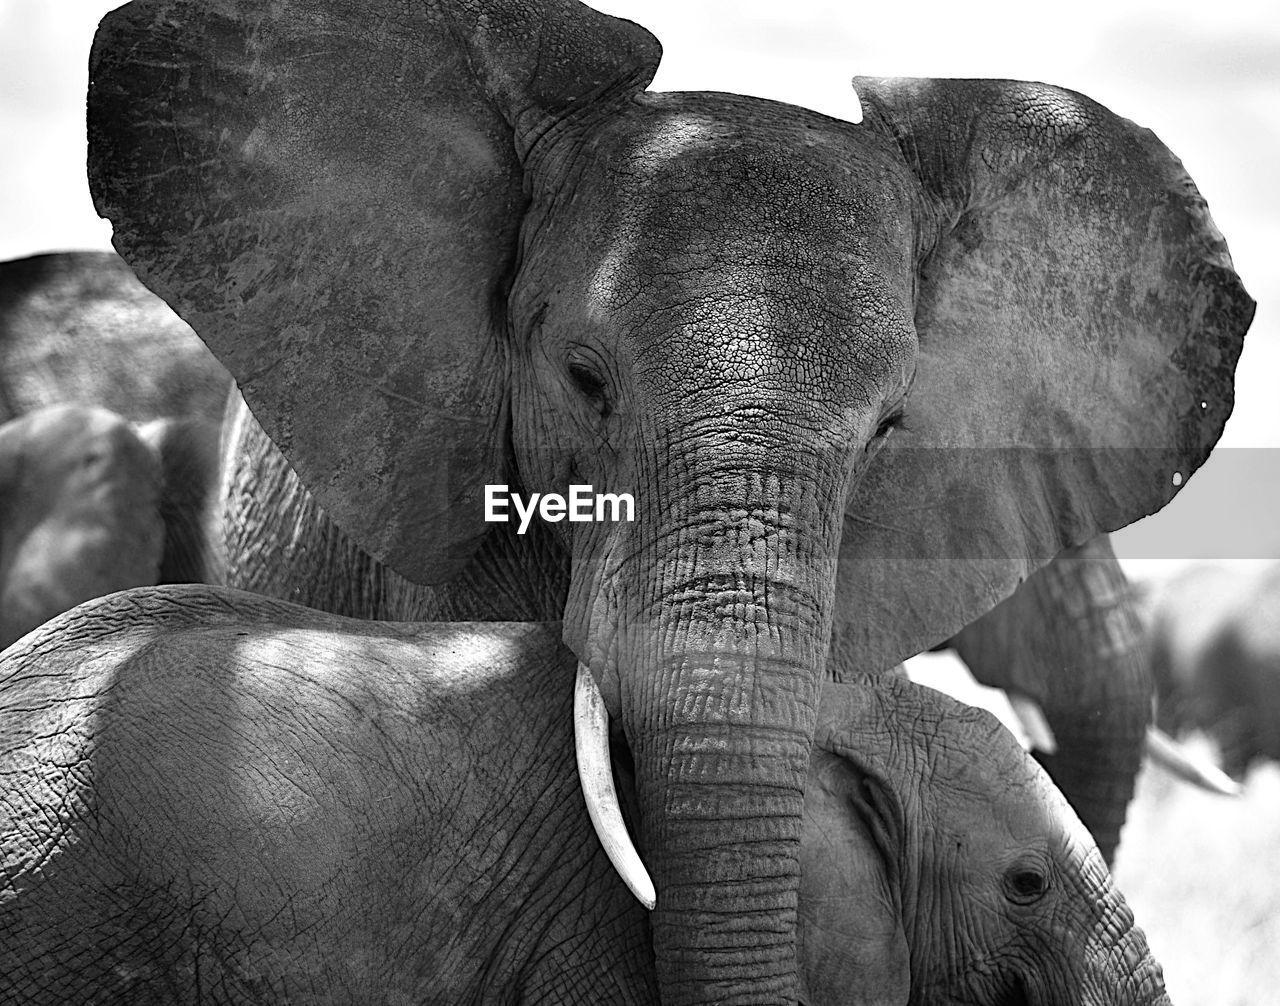 animal, elephant, animal themes, mammal, animal wildlife, animal body part, animals in the wild, vertebrate, animal trunk, two animals, group of animals, day, no people, animal head, close-up, safari, focus on foreground, outdoors, herbivorous, animal family